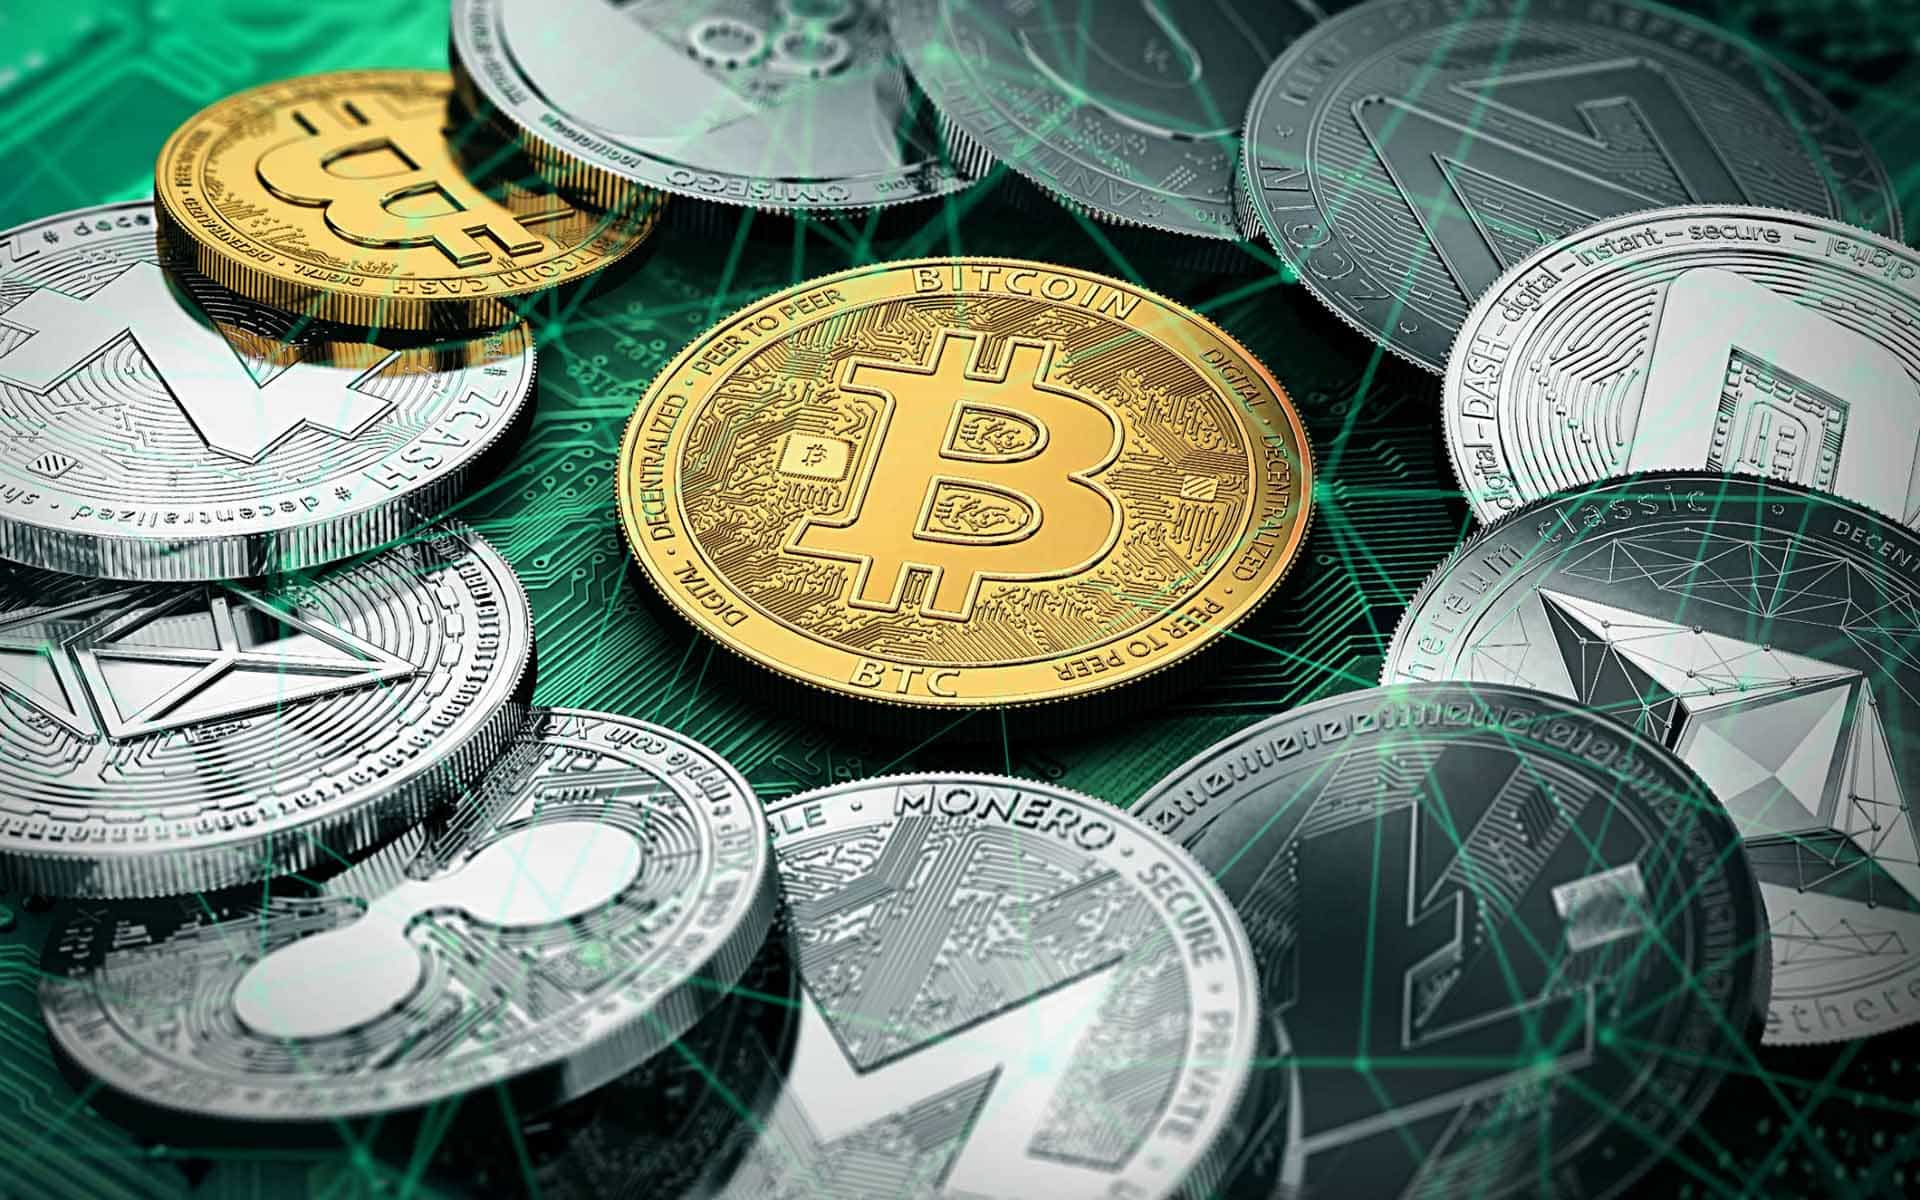 bitcoin in her gecen gun artan piyasa hakimiyeti altcoinlerin olum ilani mi